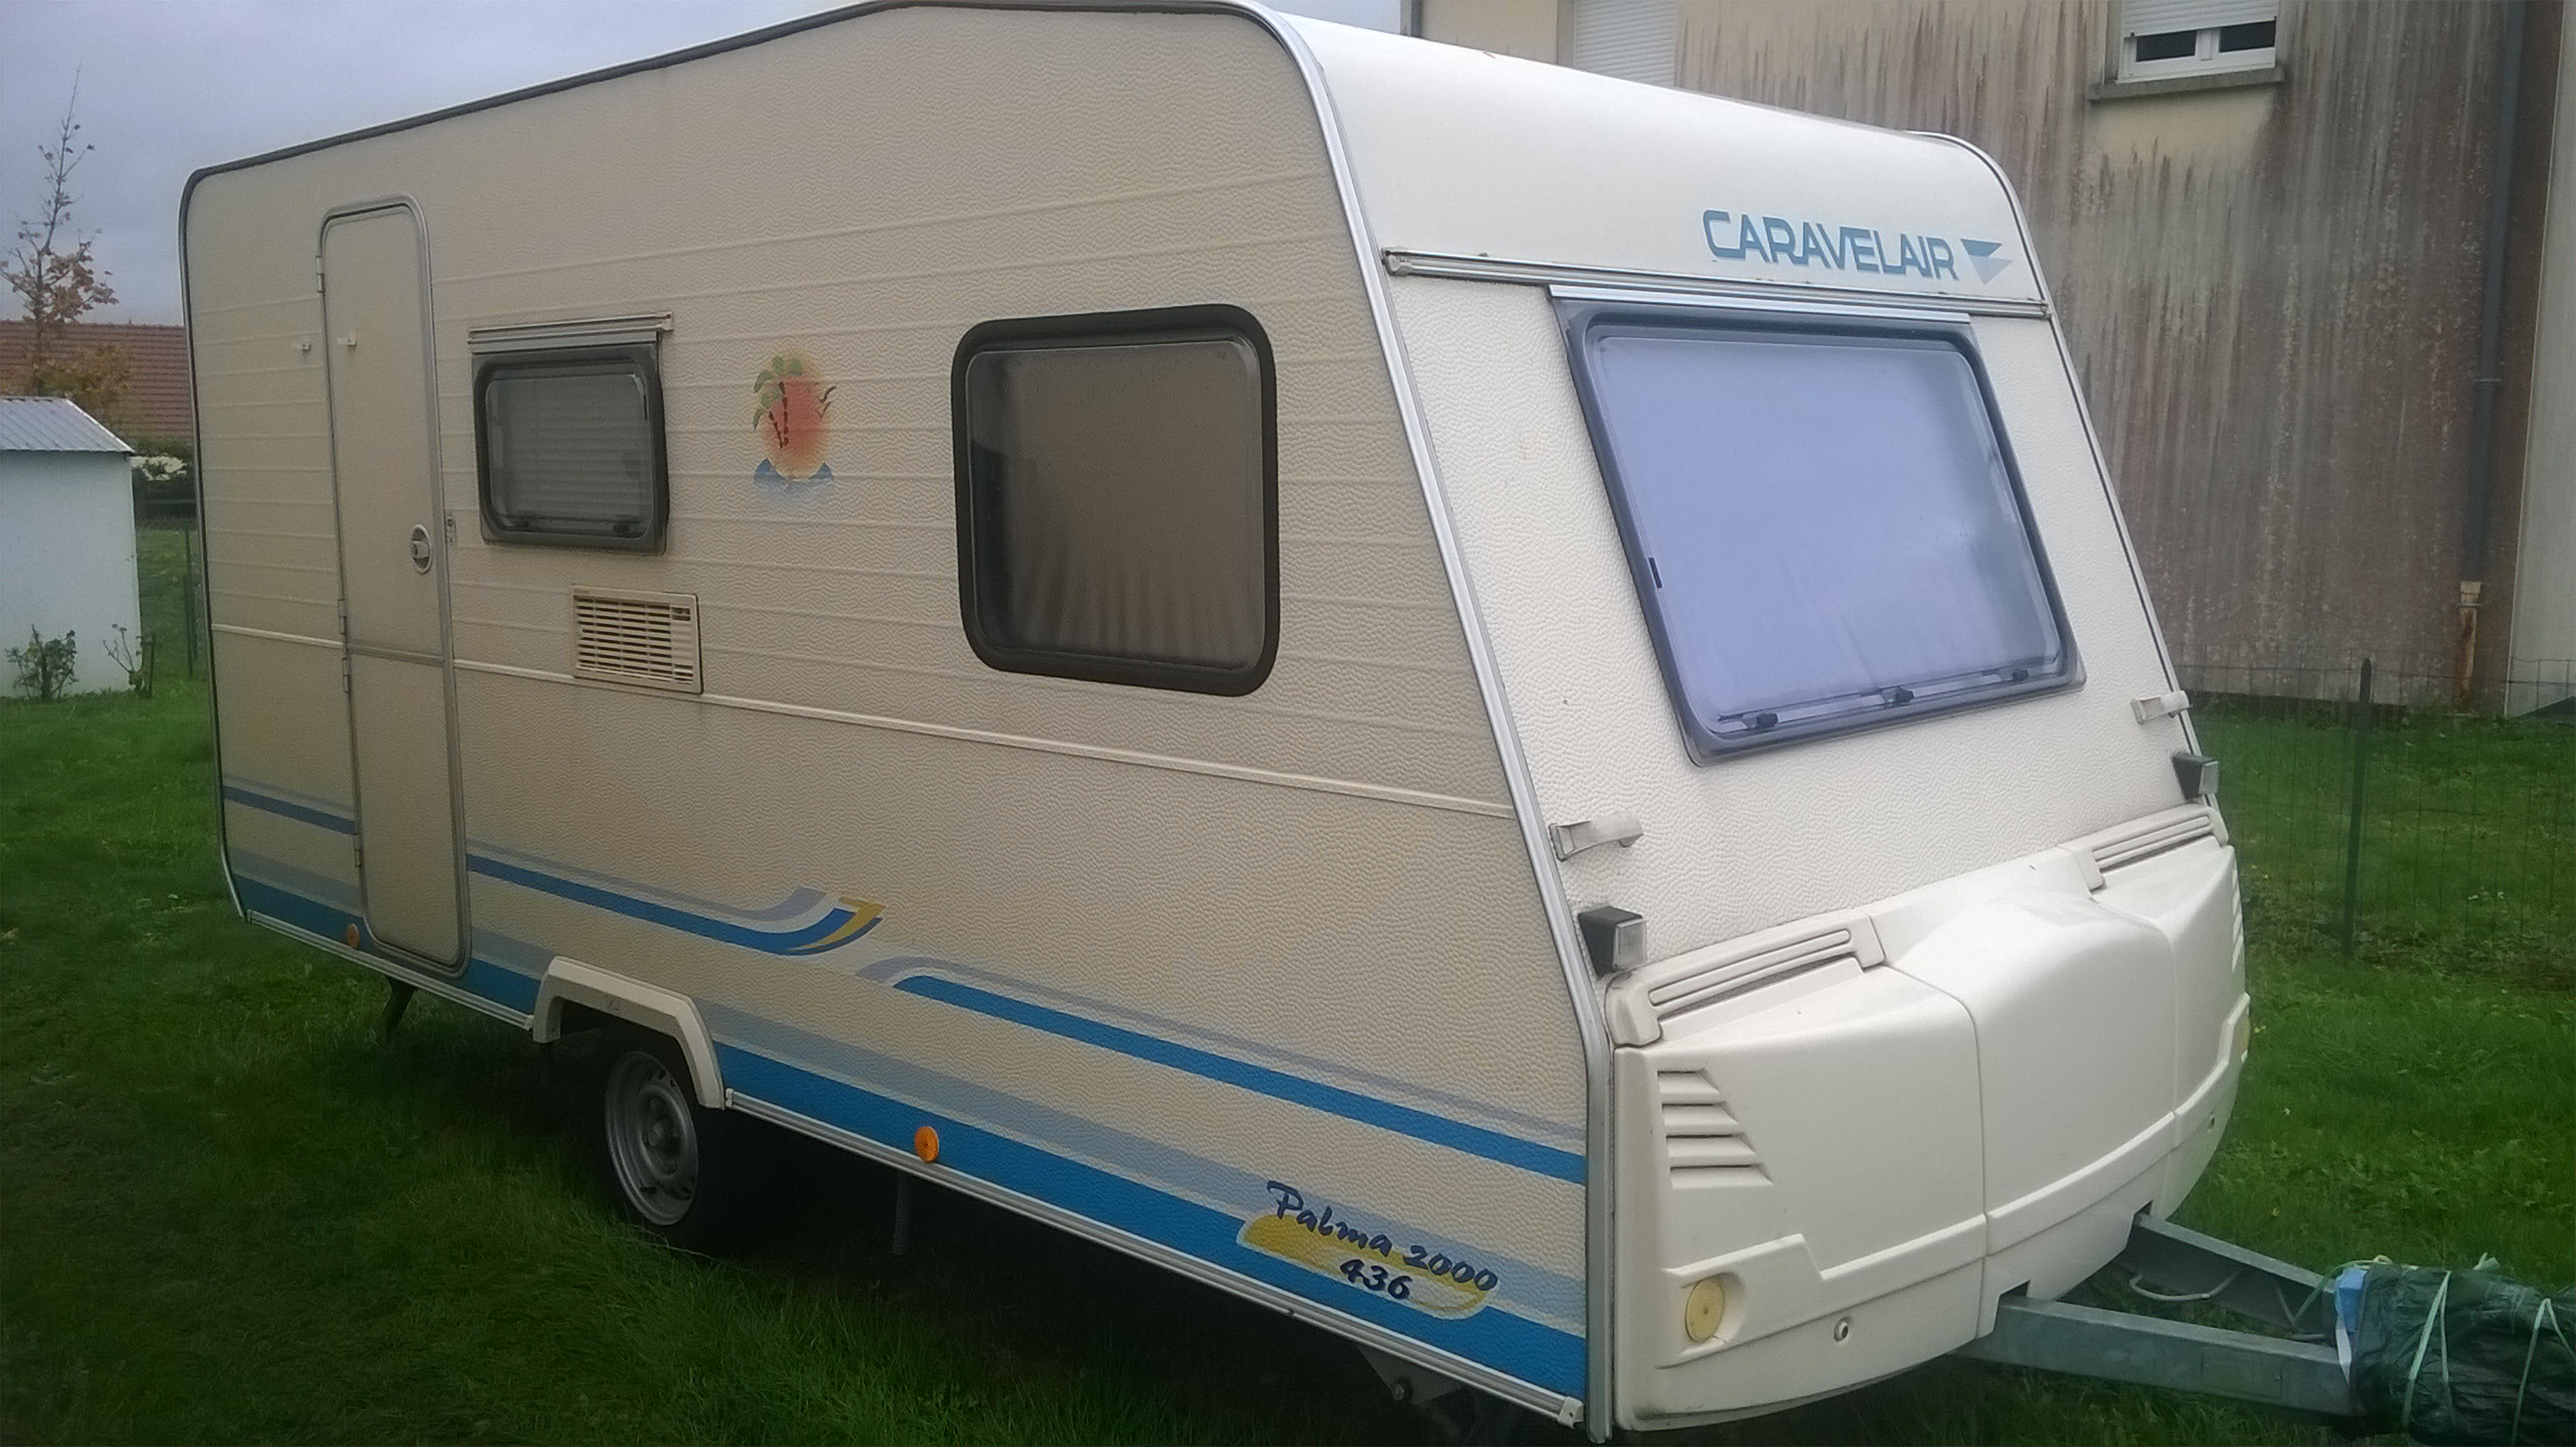 caravelair caravane occasion. Black Bedroom Furniture Sets. Home Design Ideas